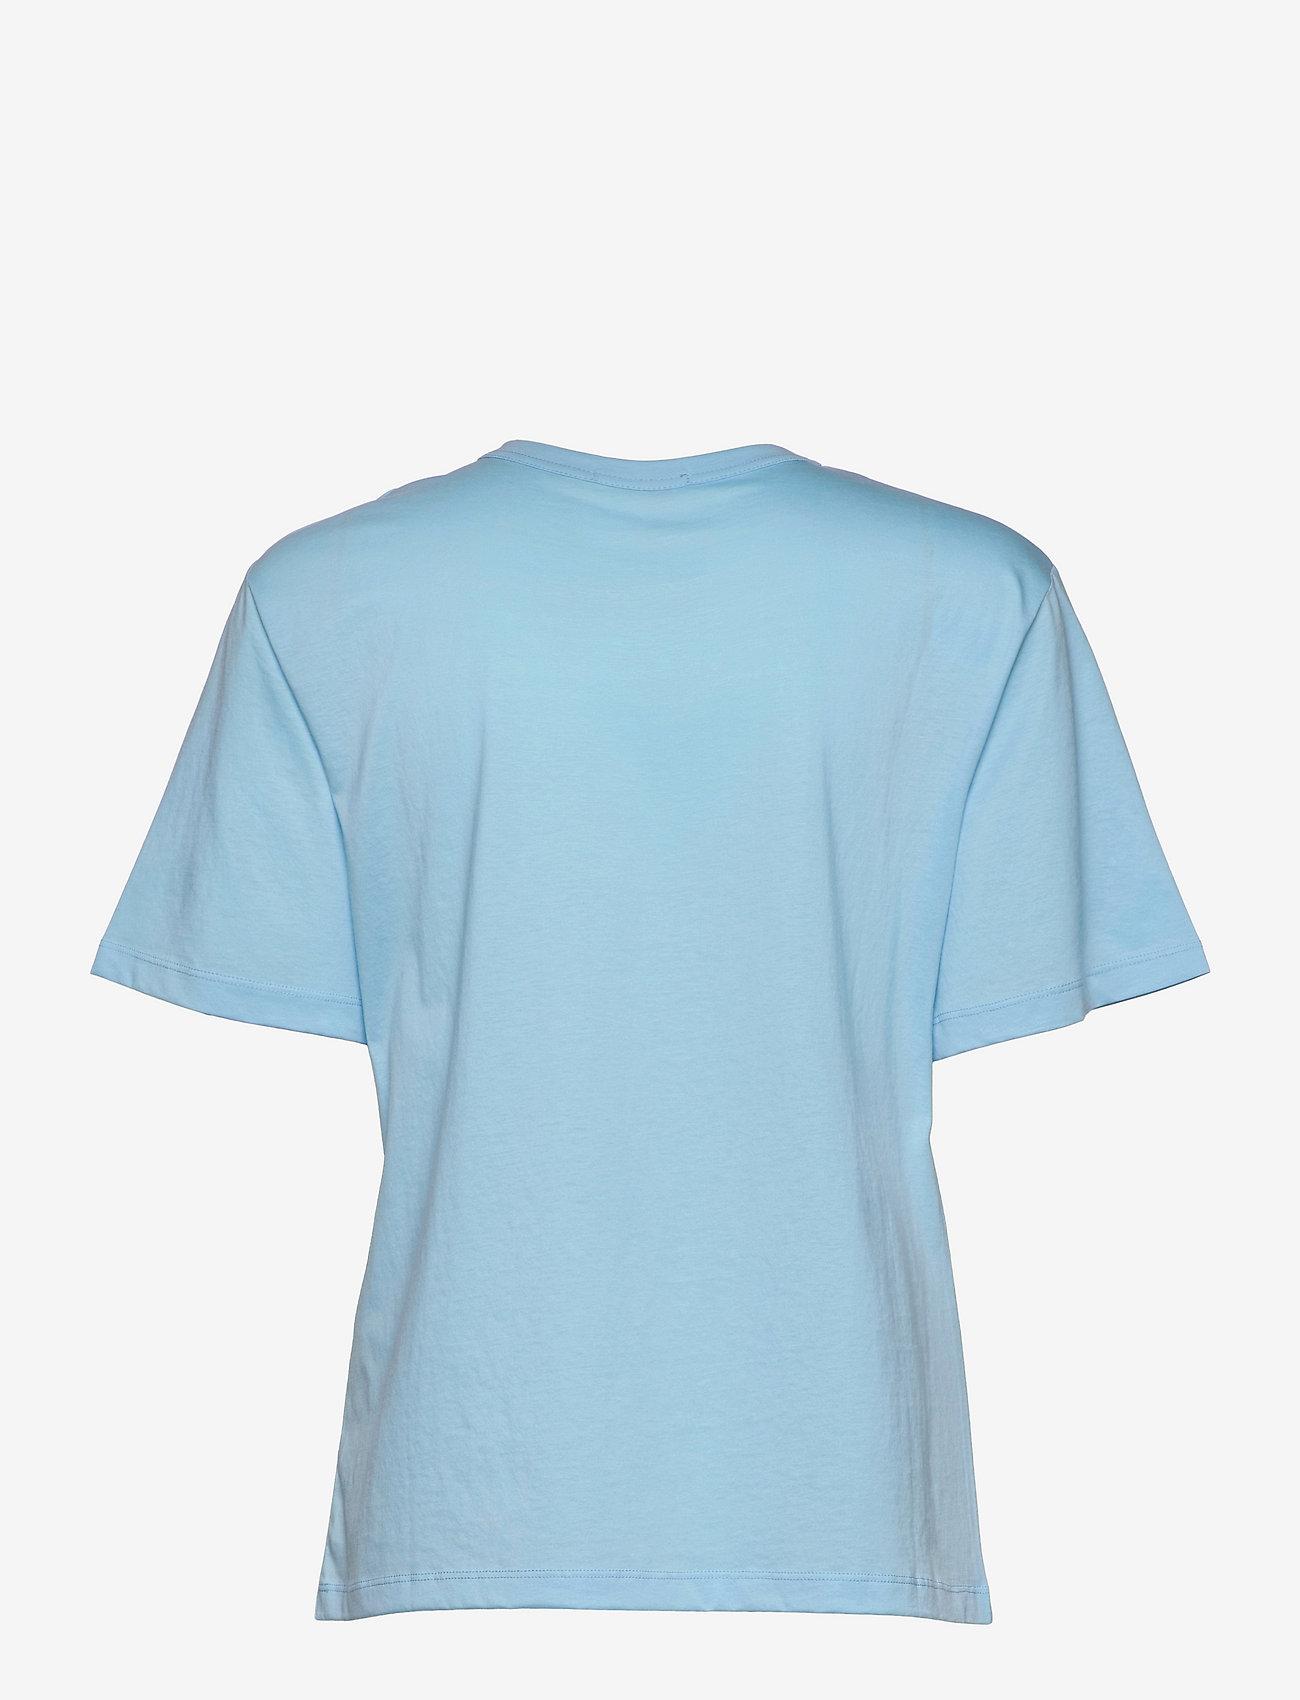 Marimekko - KAPINA LOGO T-SHIRT - t-shirts - light blue, light peach - 1